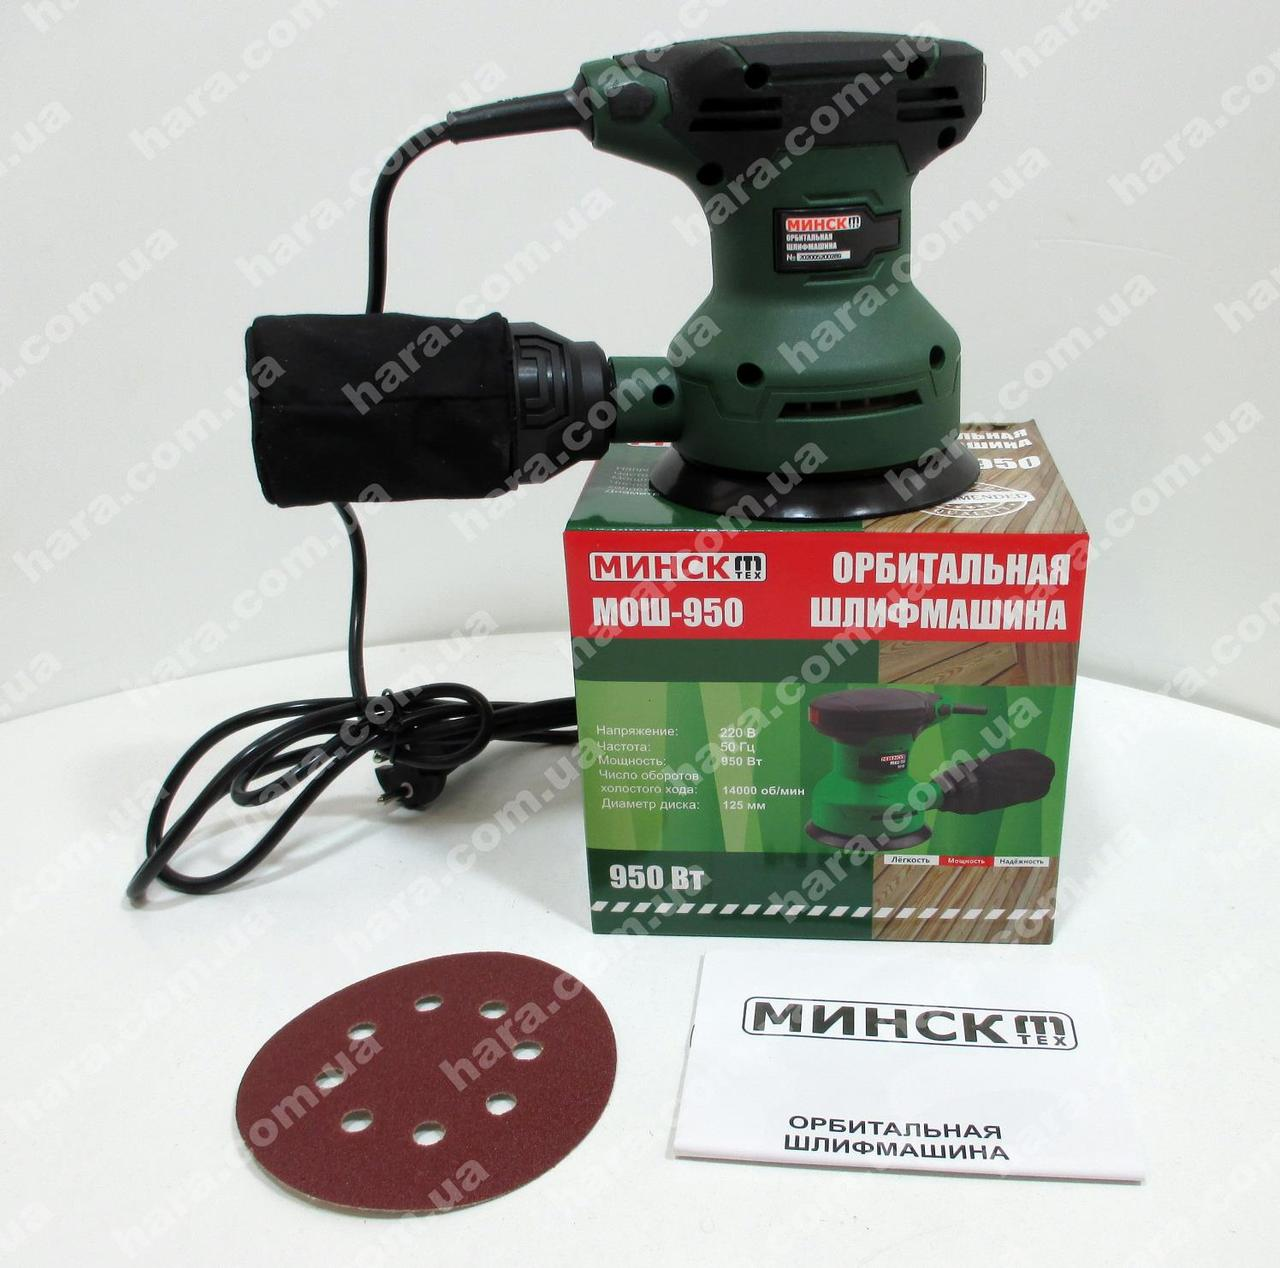 Орбитальная шлифмашина Минск МОШ-950